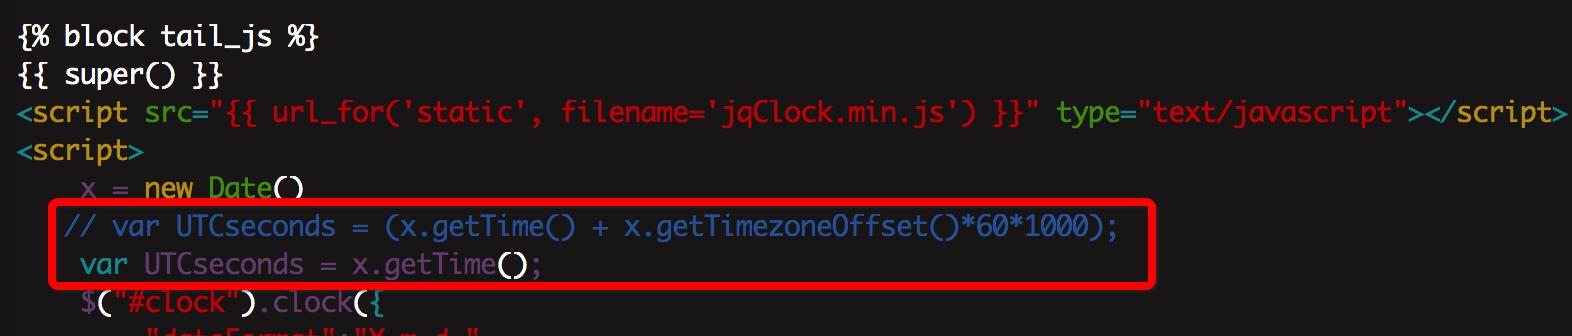 airflow-webserver-time